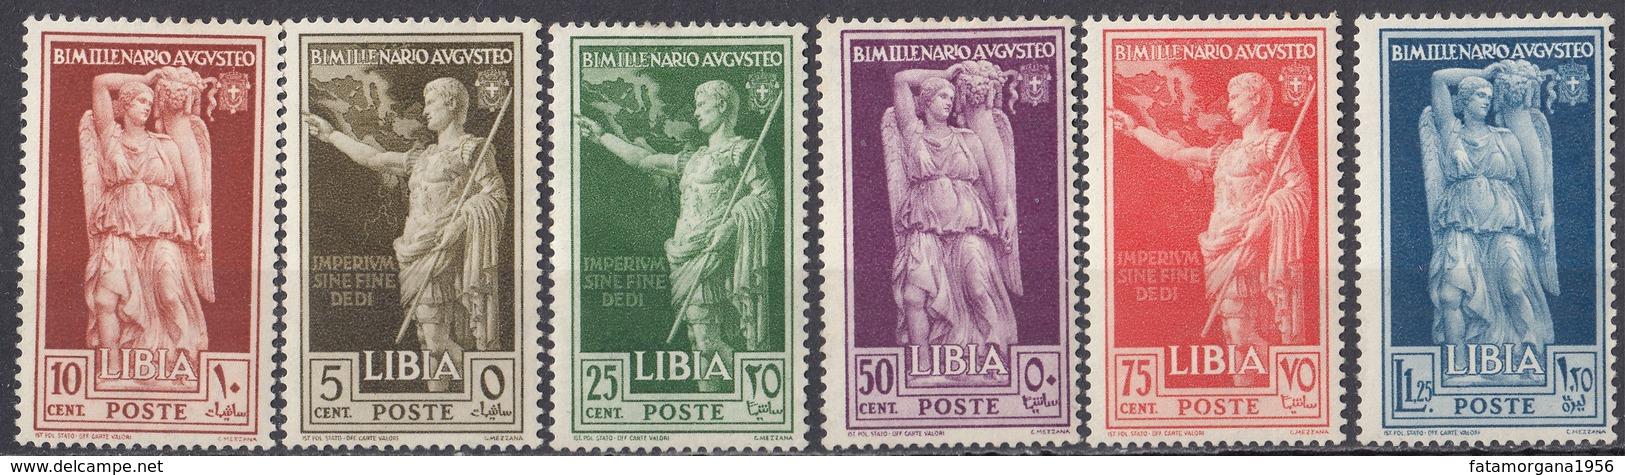 LIBIA - 1938 - Serie Completa Nuova MH: Yvert 68/73, 6 Valori. - Libia